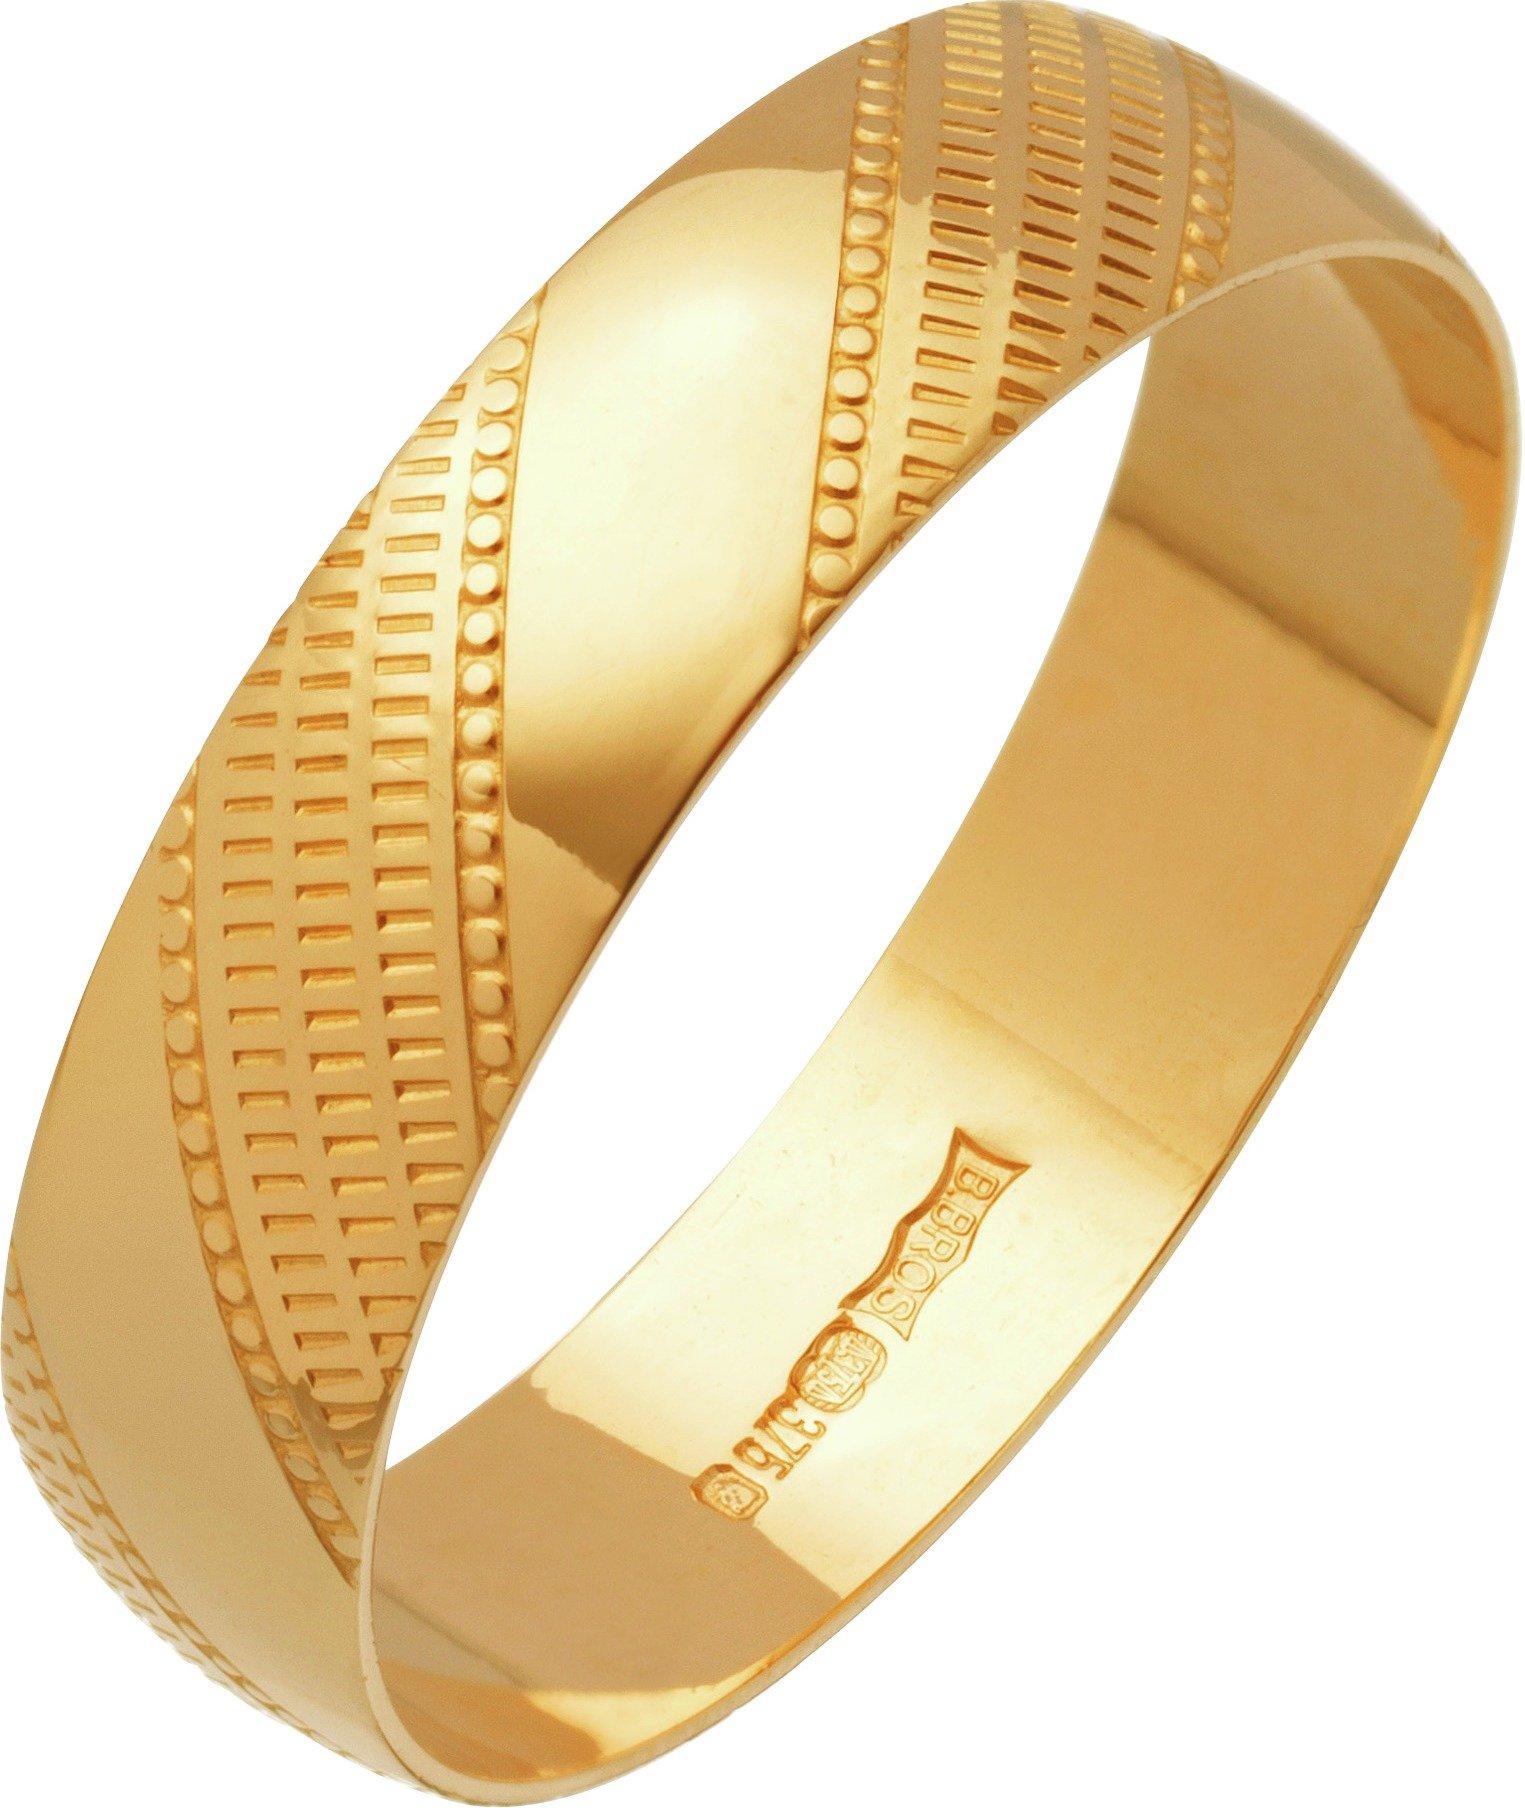 9ct-gold-diamond-cut-wedding-ring